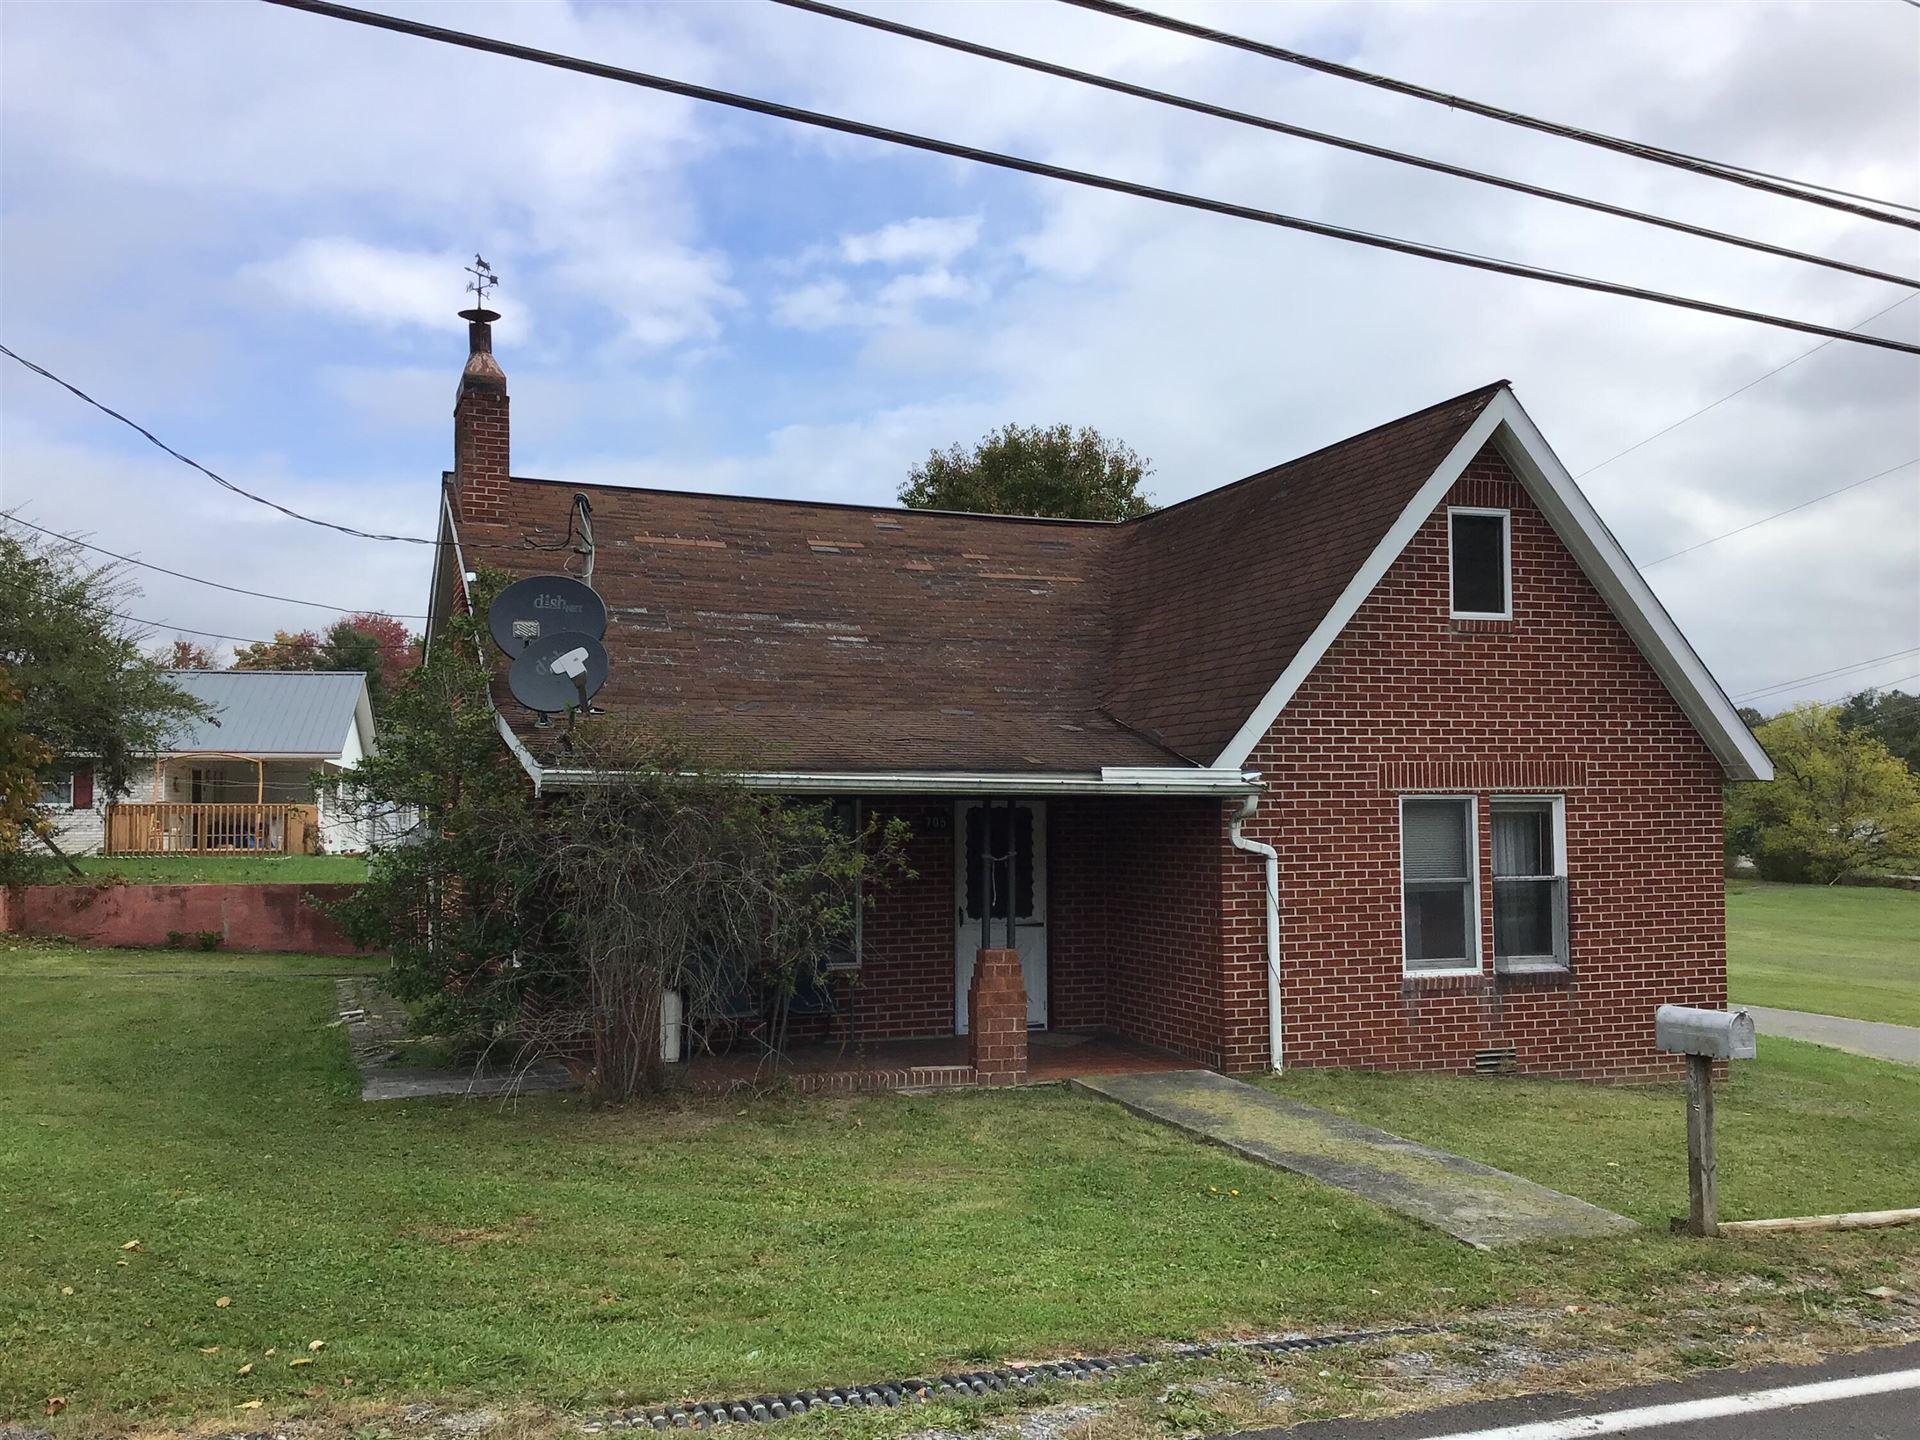 Photo of 705 Coeburn Road, Wise, VA 24293 (MLS # 9930250)